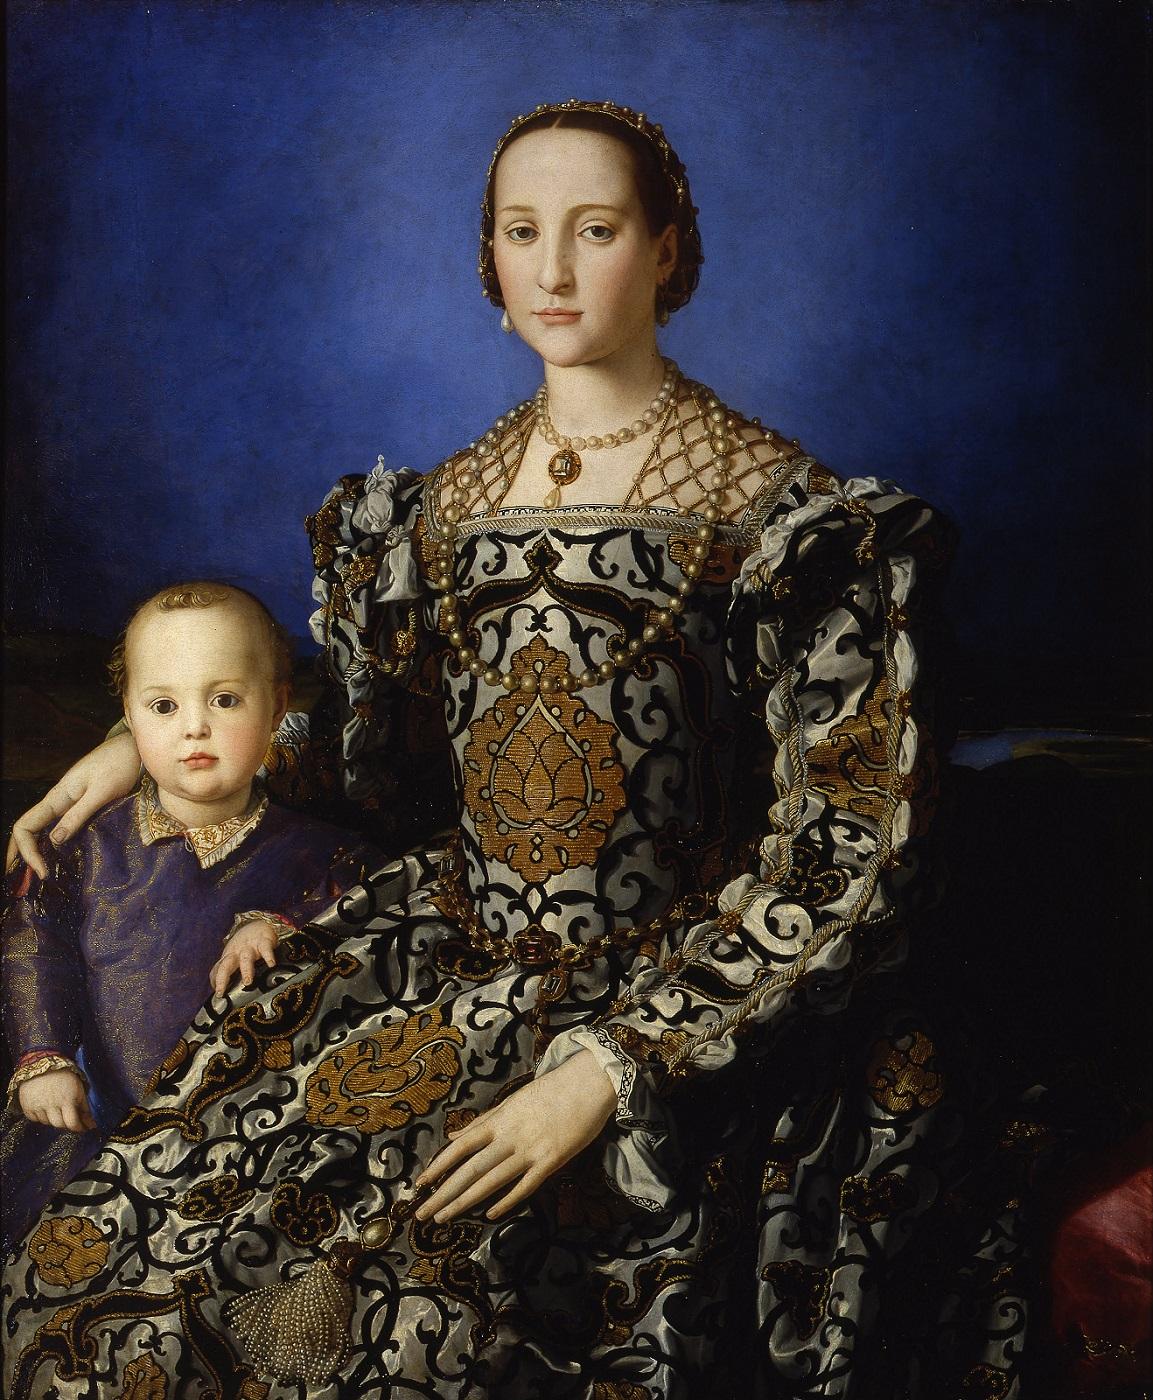 Portret van Eleonora di Toledo en haar zoon Giovanni door Agnolo Bronzino, 1545, Galleria degli Uffizi, Florence